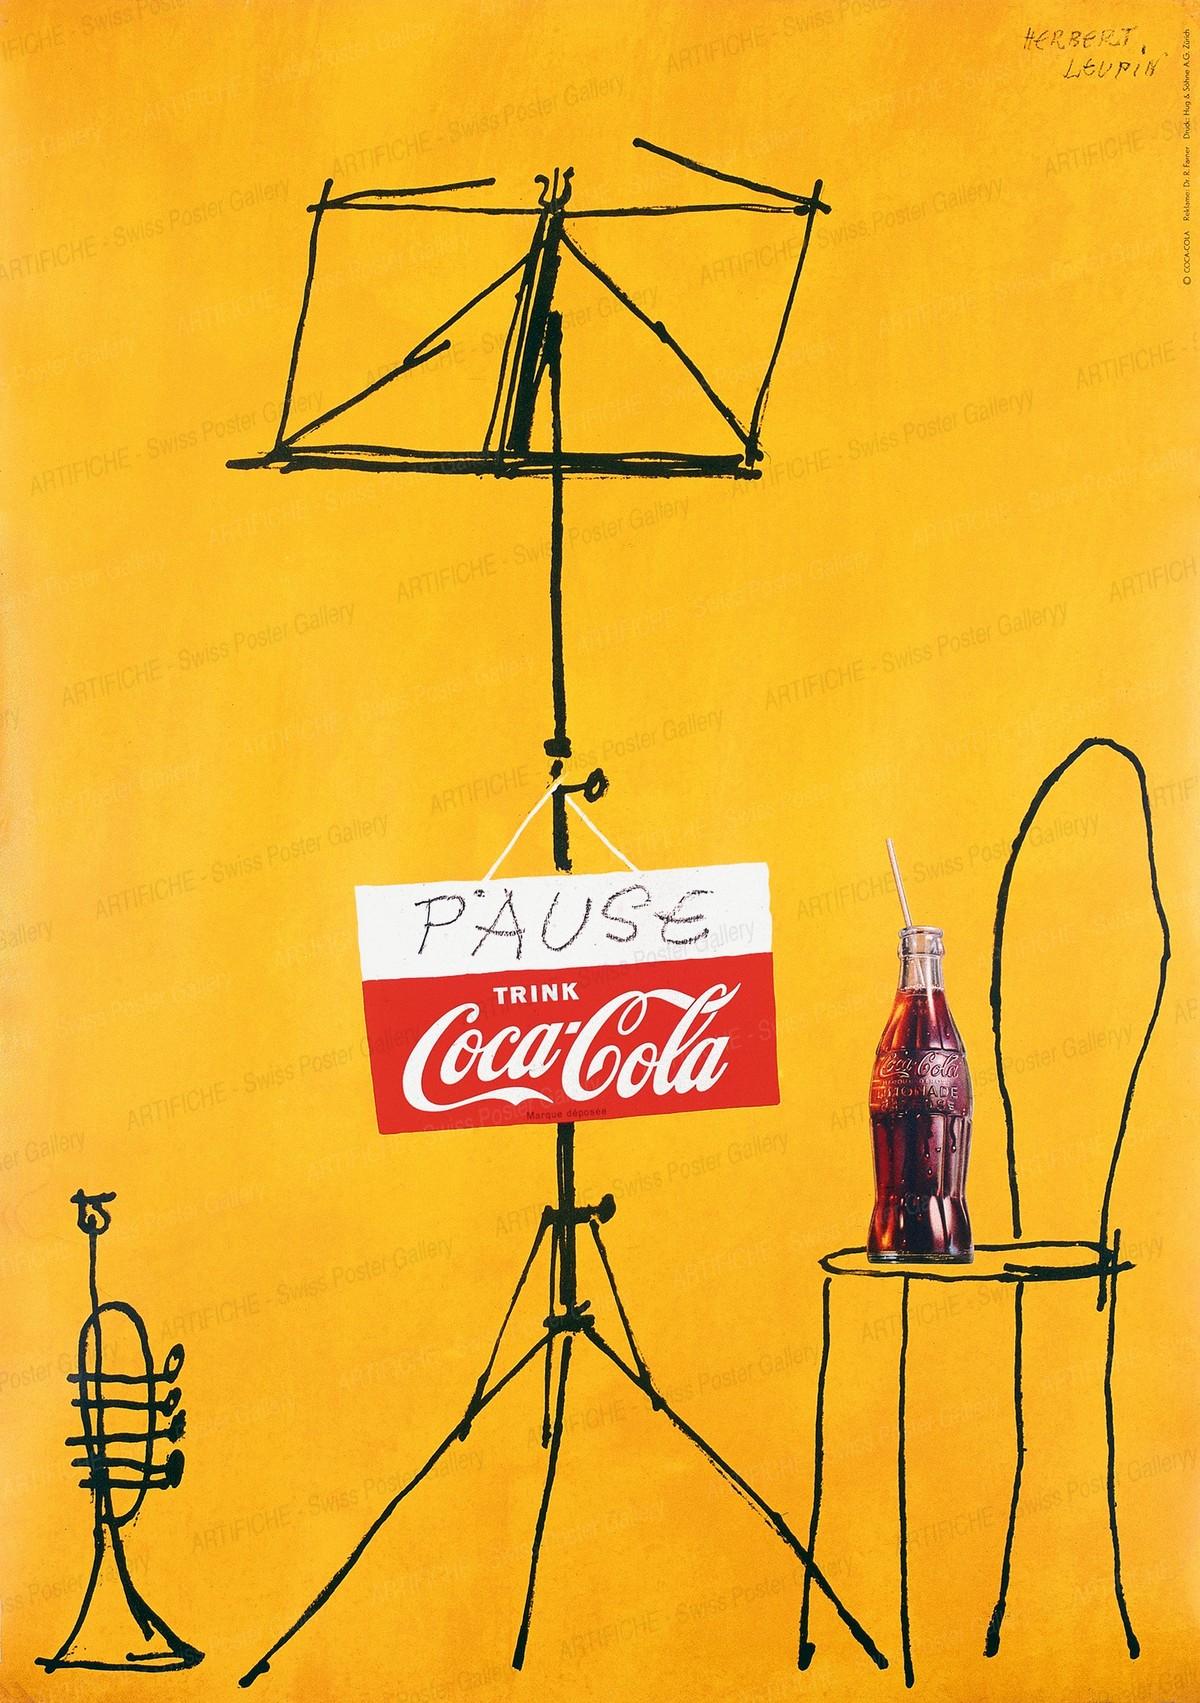 PAUSE trink Coca Cola, Herbert Leupin